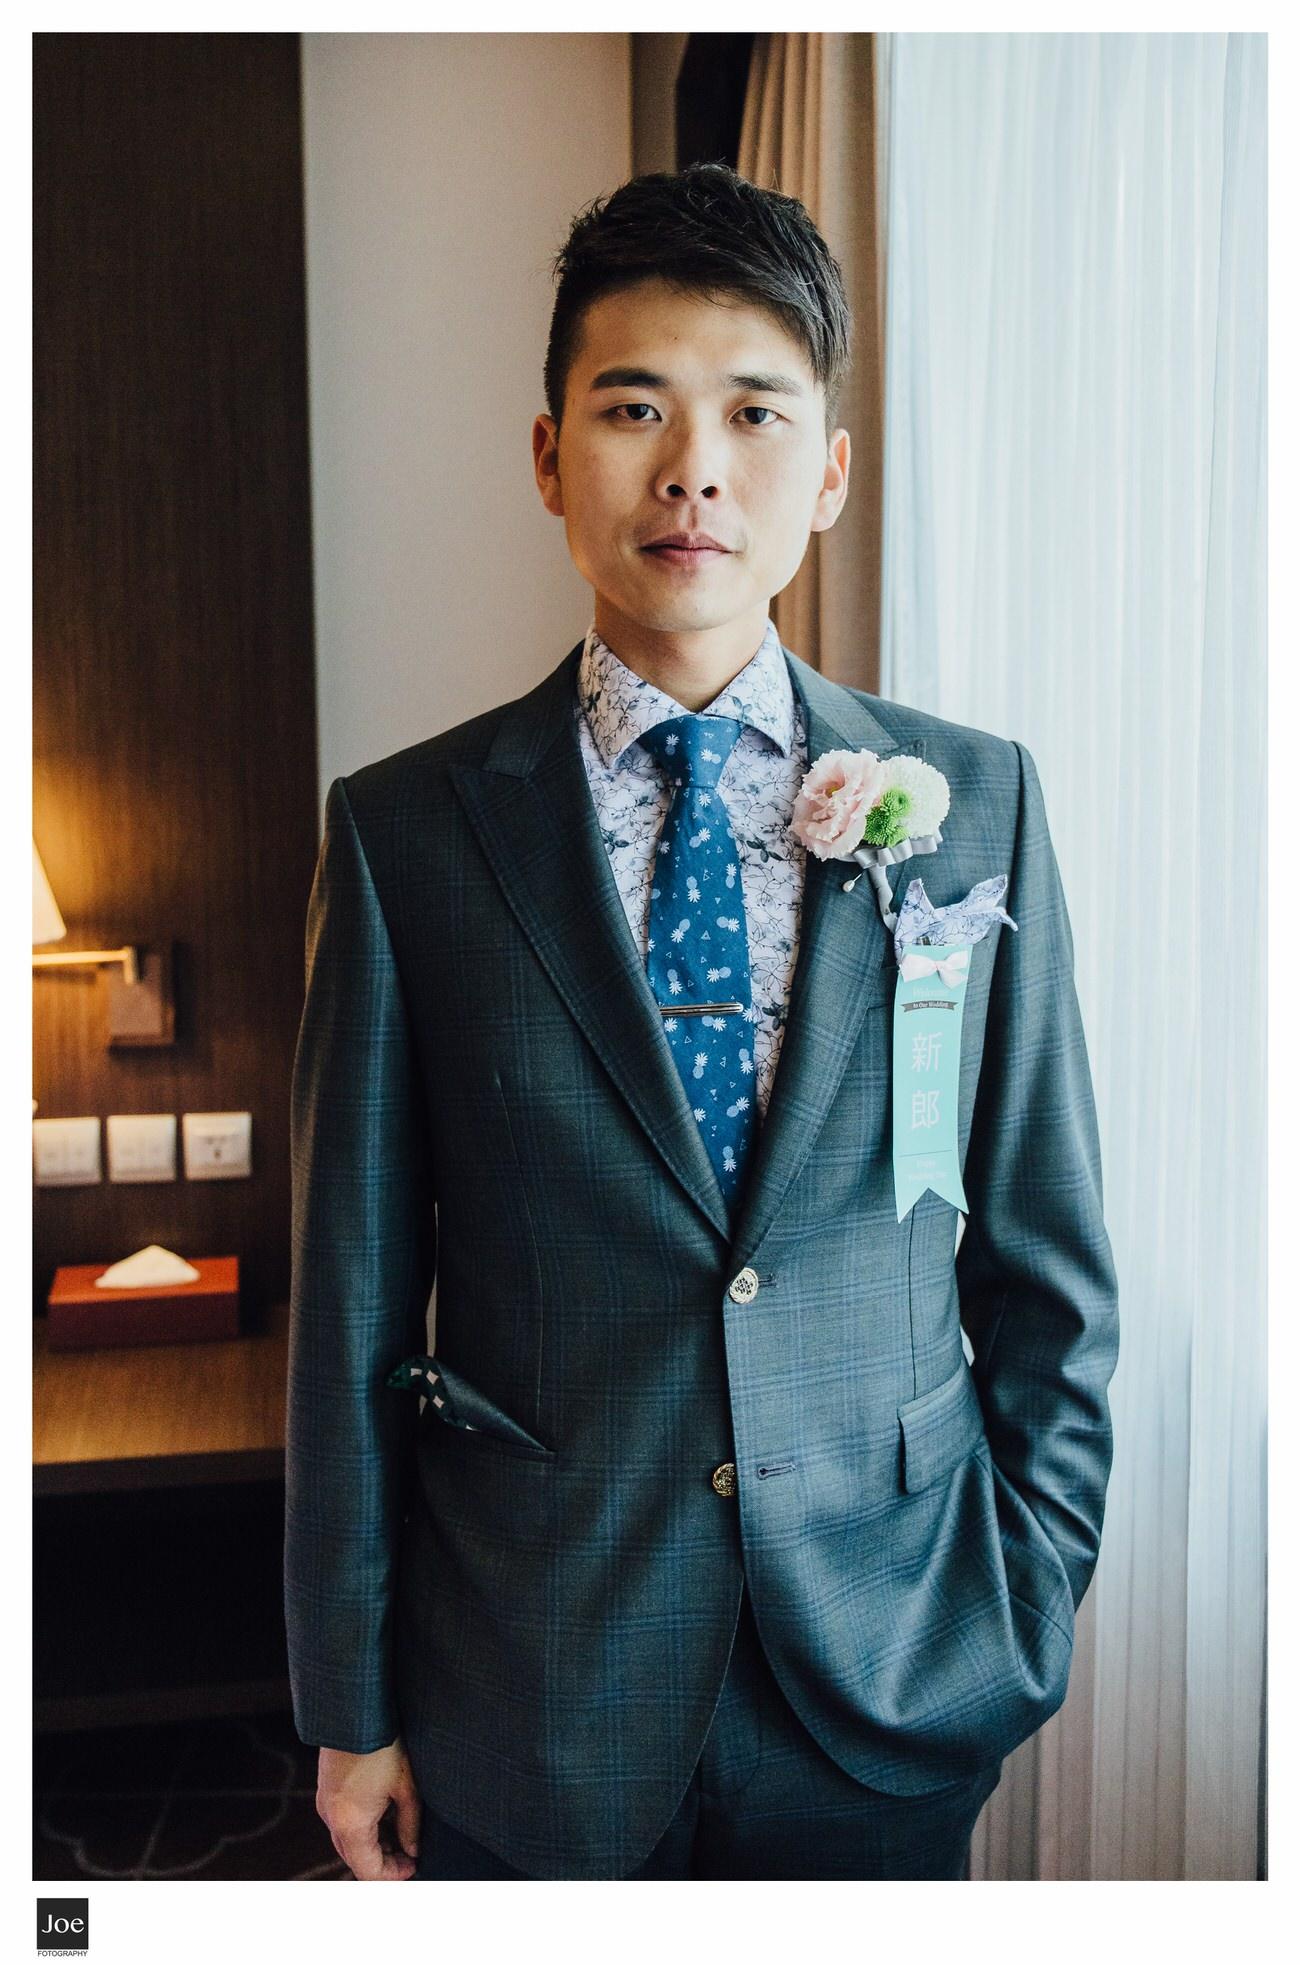 sunworld-dynasty-hotel-taipei-wedding-photo-joe-fotography-angel-jay-095.jpg